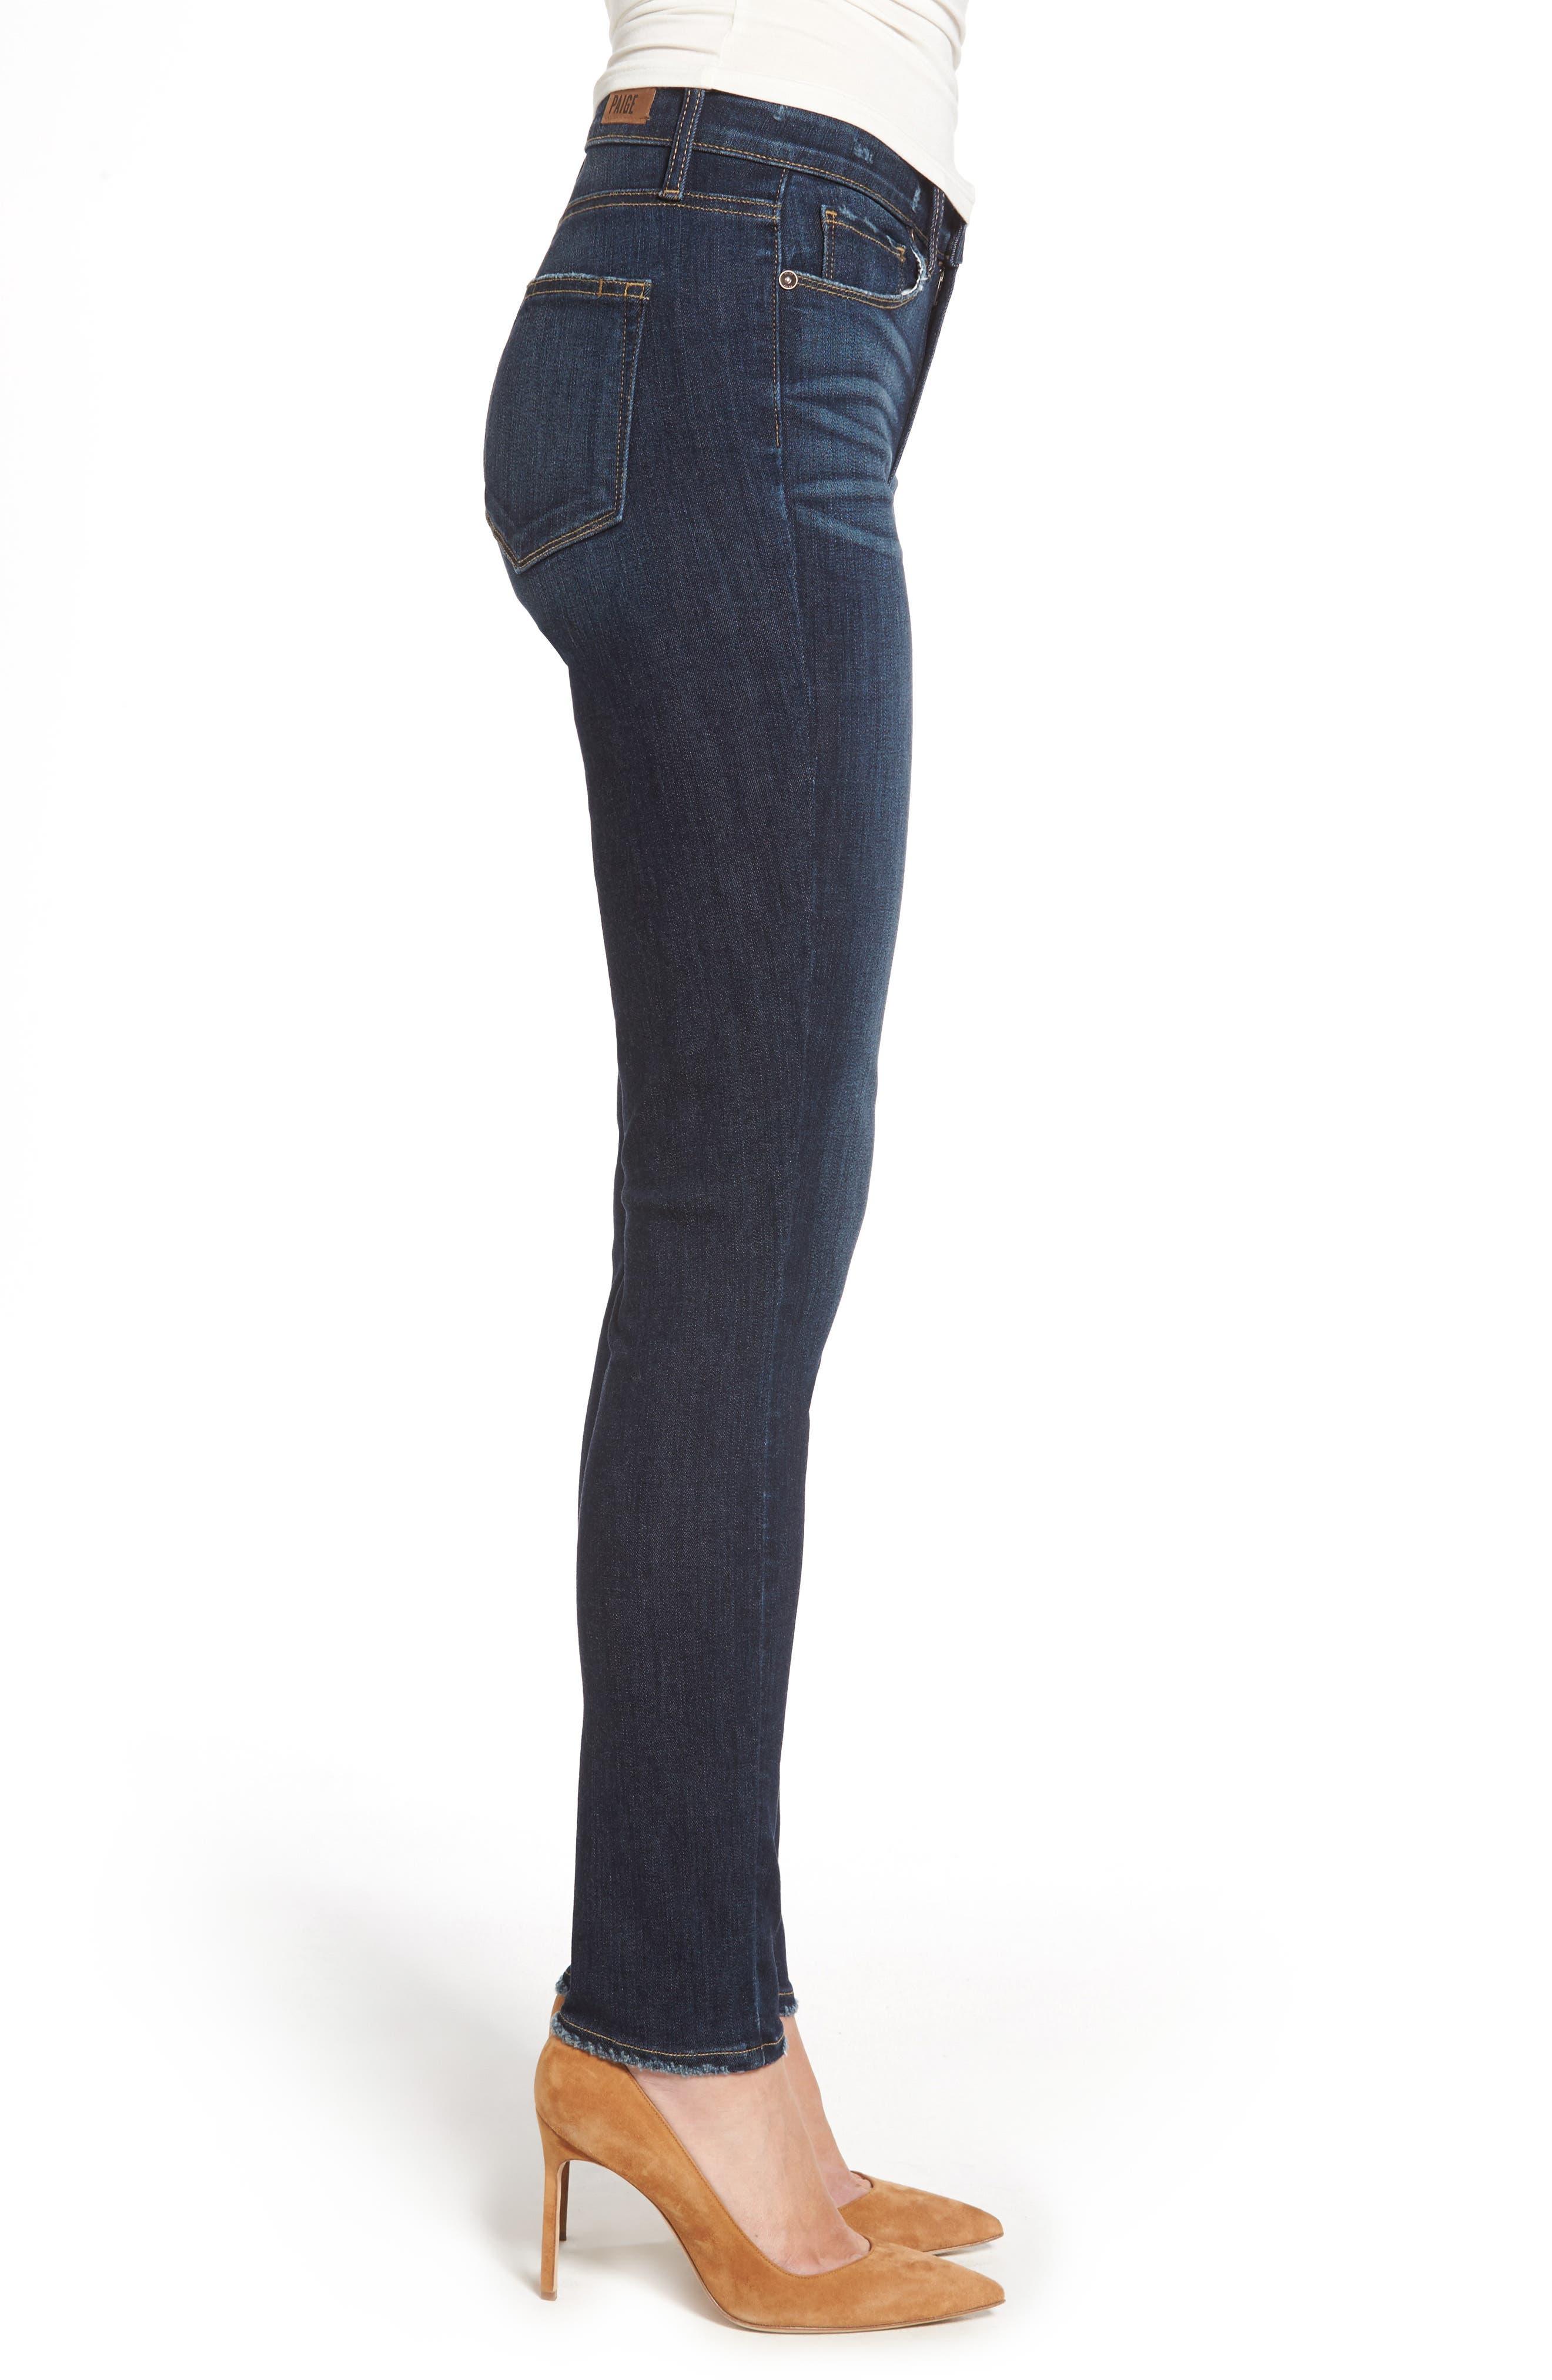 Alternate Image 3  - PAIGE Hoxton High Waist Ankle Skinny Jeans (Revere)